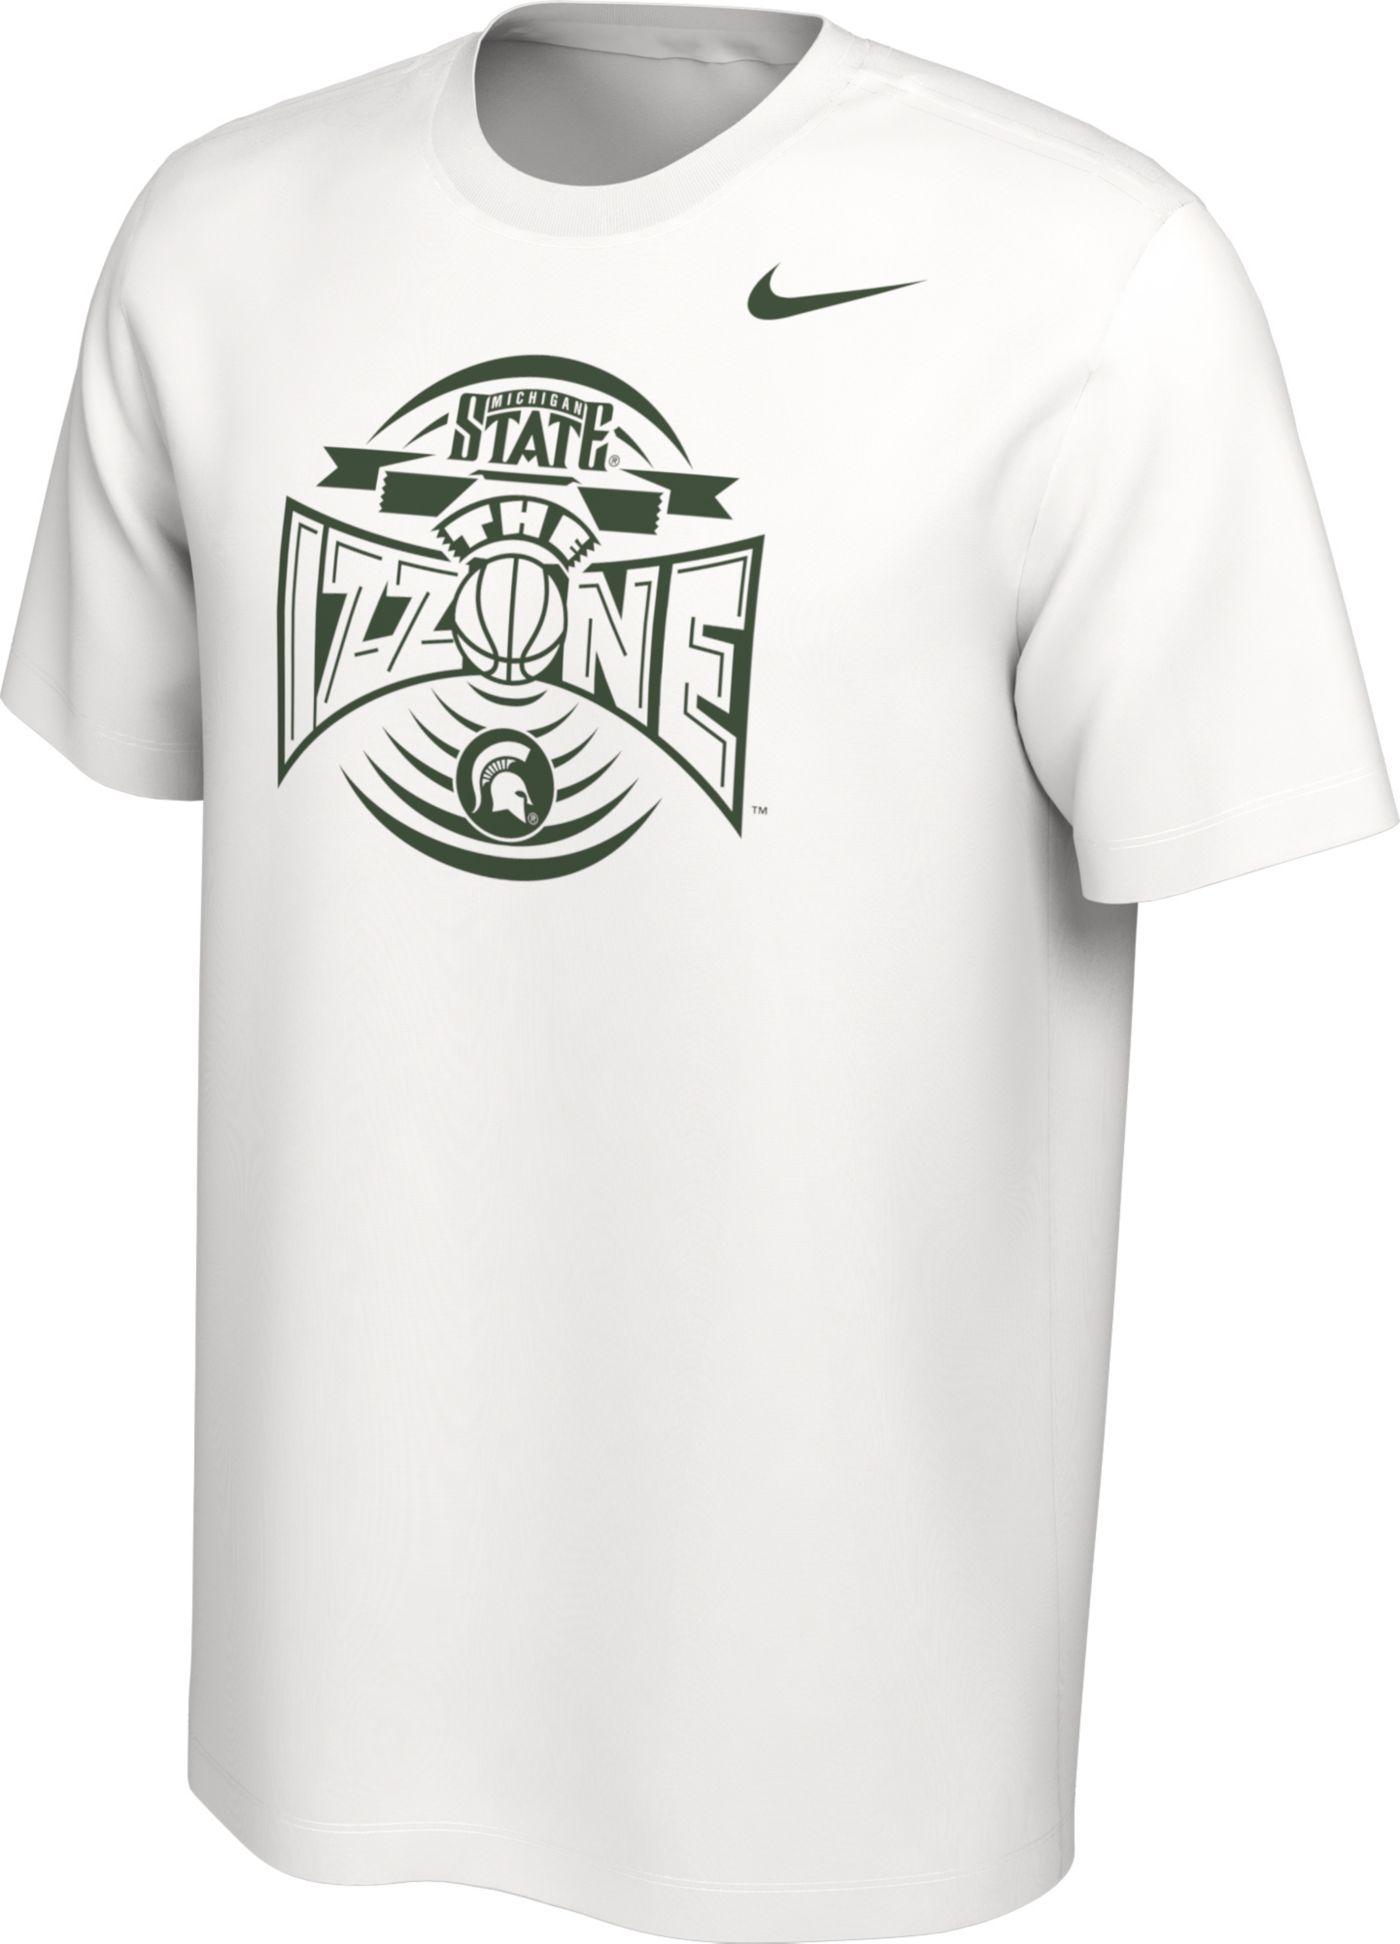 Nike Men's Michigan State Spartans 'The Izzone' Student Body Basketball White T-Shirt